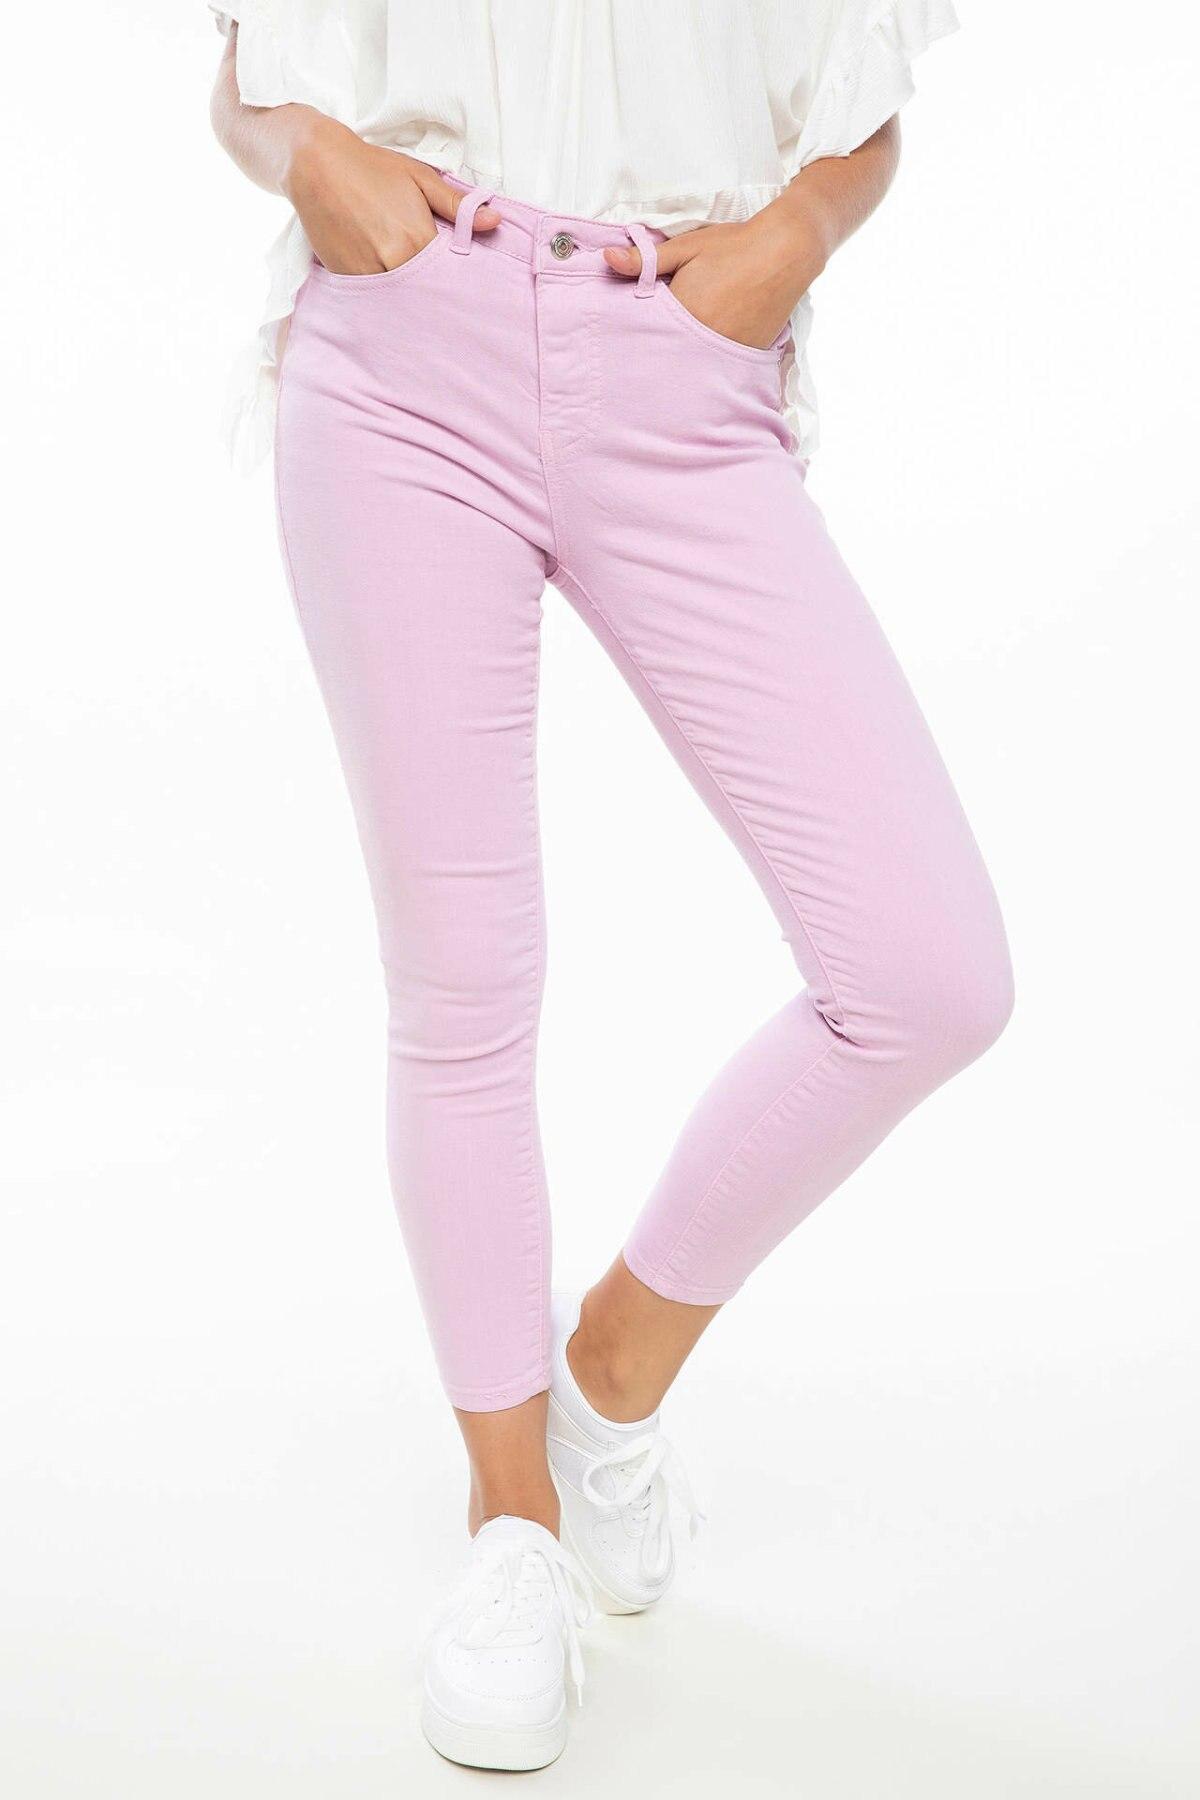 DeFacto Woman Spring Long Pants Elegant Women Zipper Pencil Pants Female Skinny Bottoms Trousers Comfort Pink - J9775AZ18HS